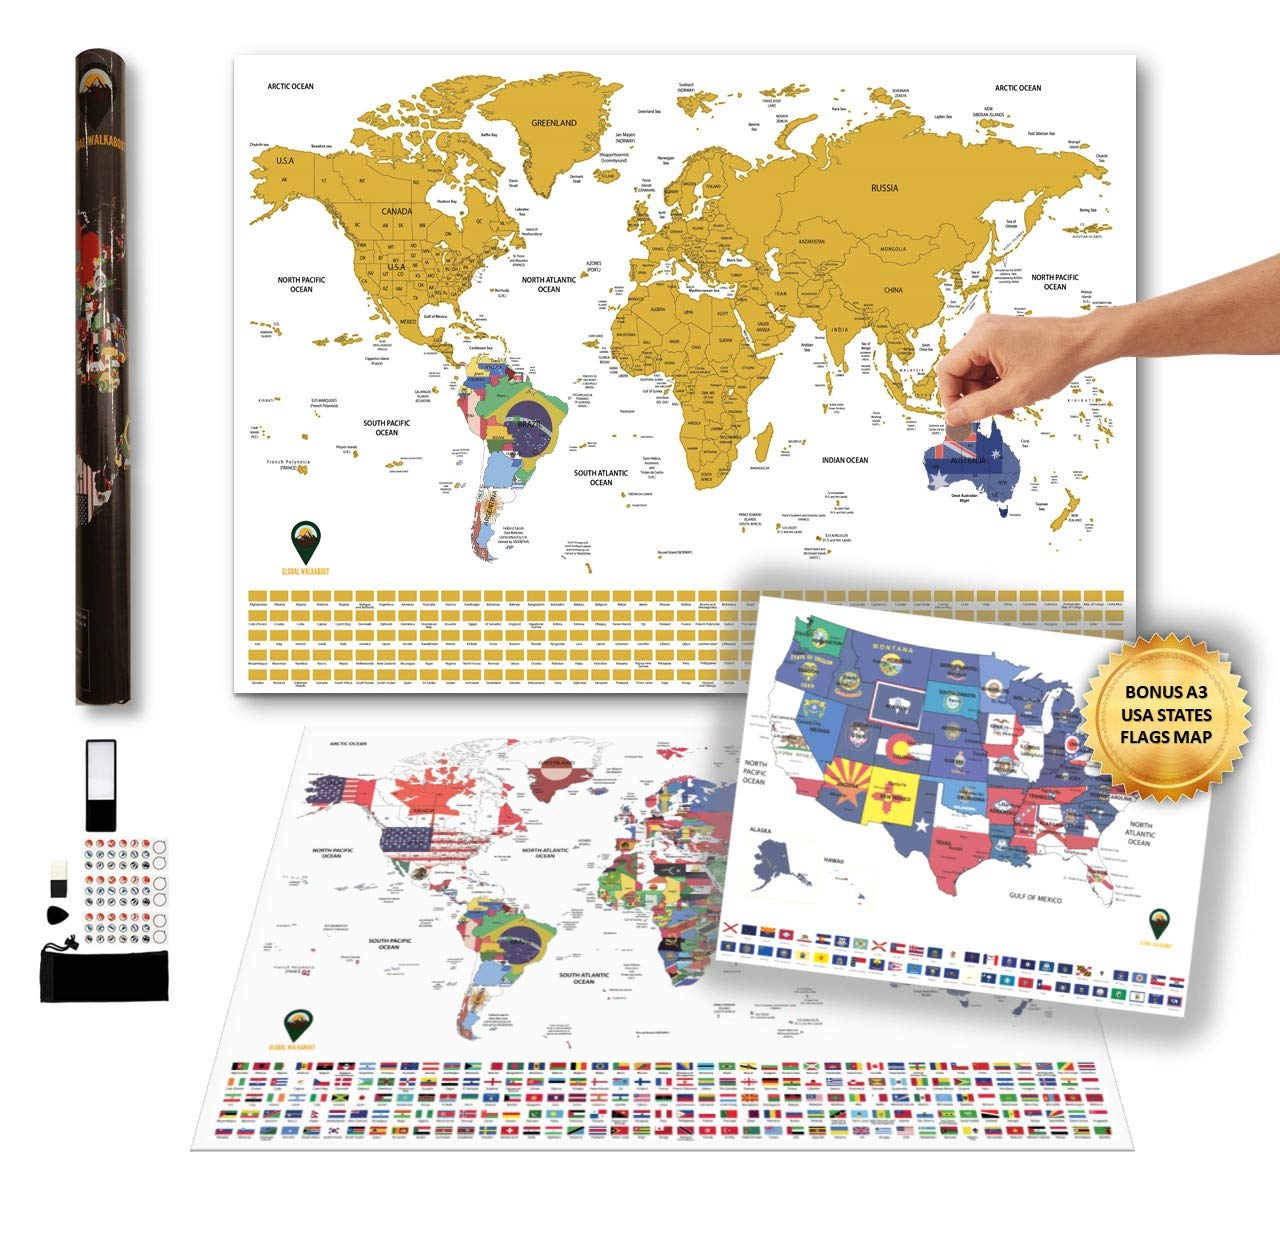 Scratch Off World Map XXL with Bonus A3 USA map - GLOBAL ... on red usa map, folding usa map, black usa map, white usa map, gold usa map, signature usa map,